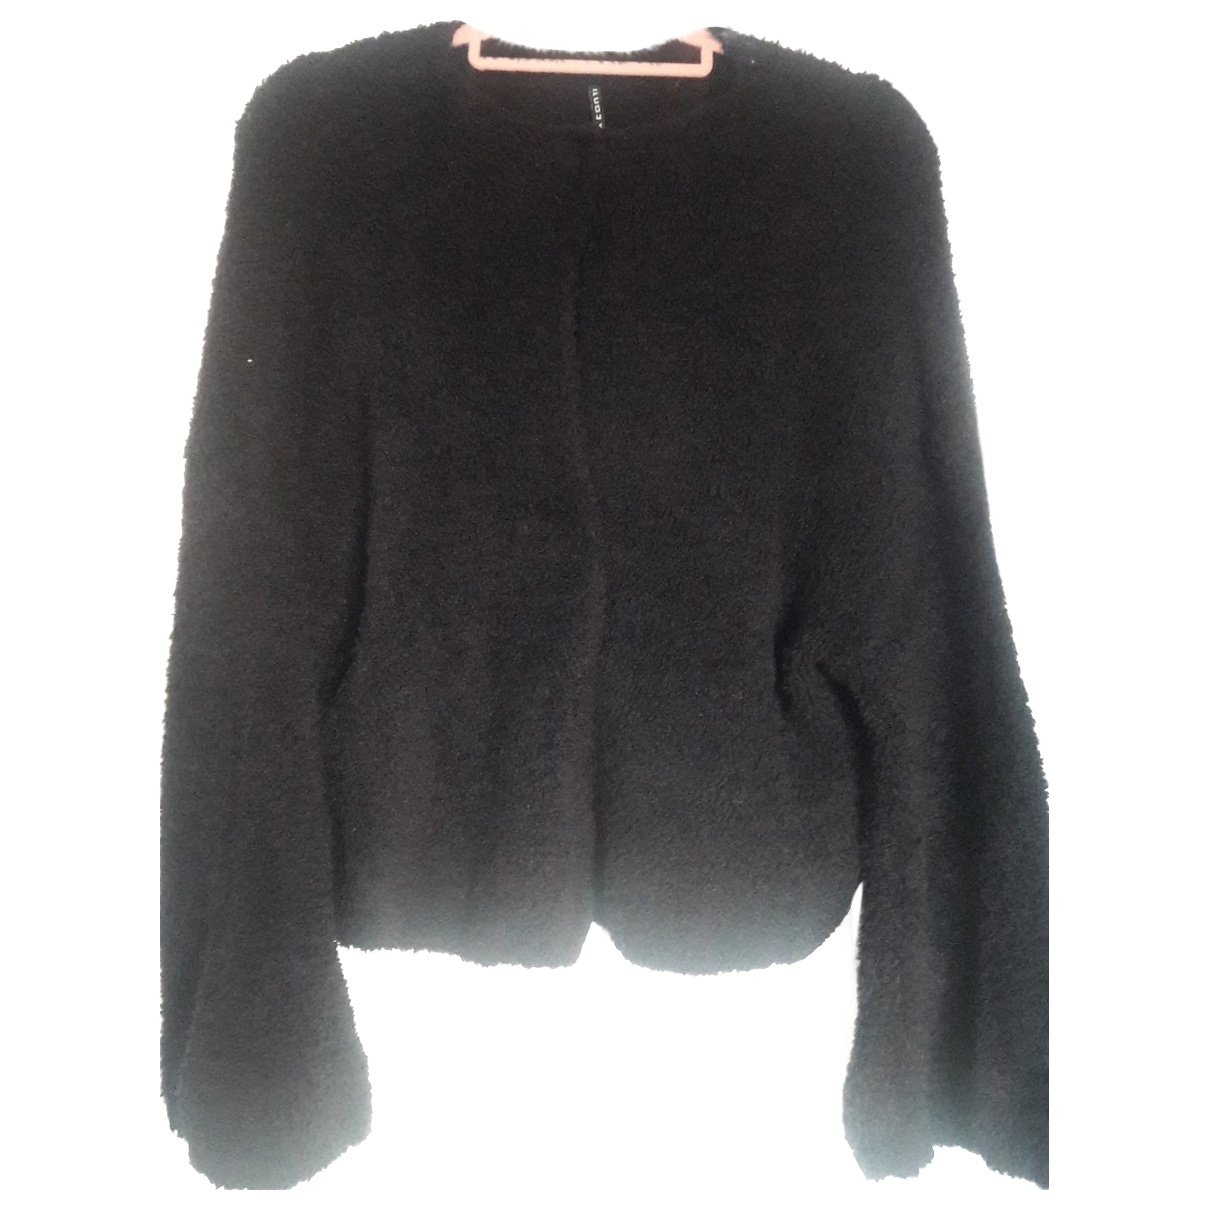 Liviana Conti \N Black Wool jacket for Women One Size FR